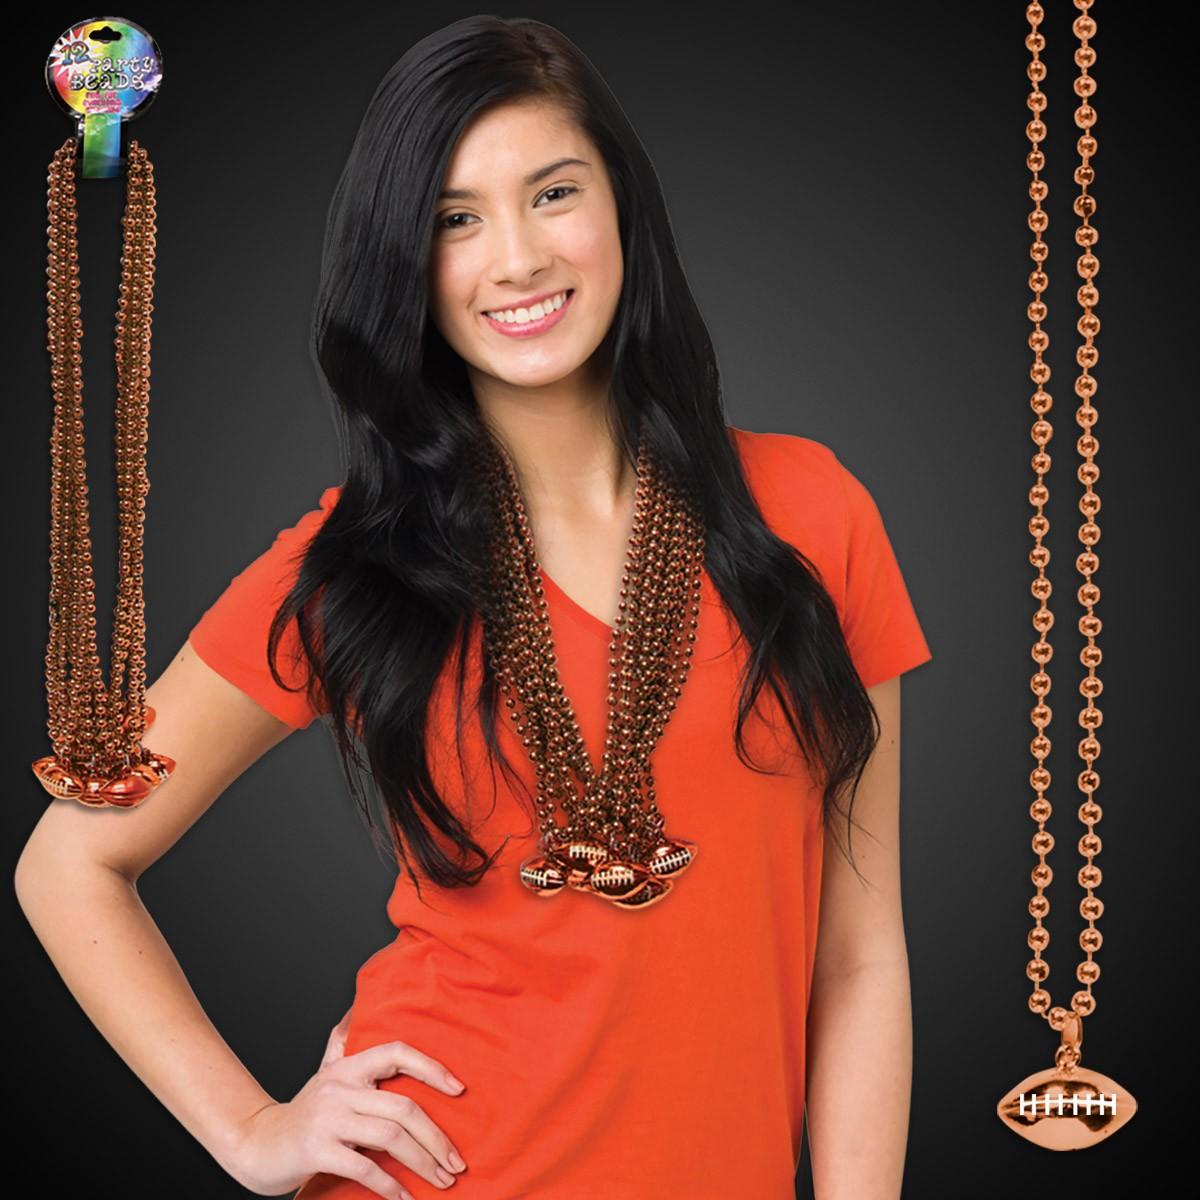 Orange Football Necklace Beads